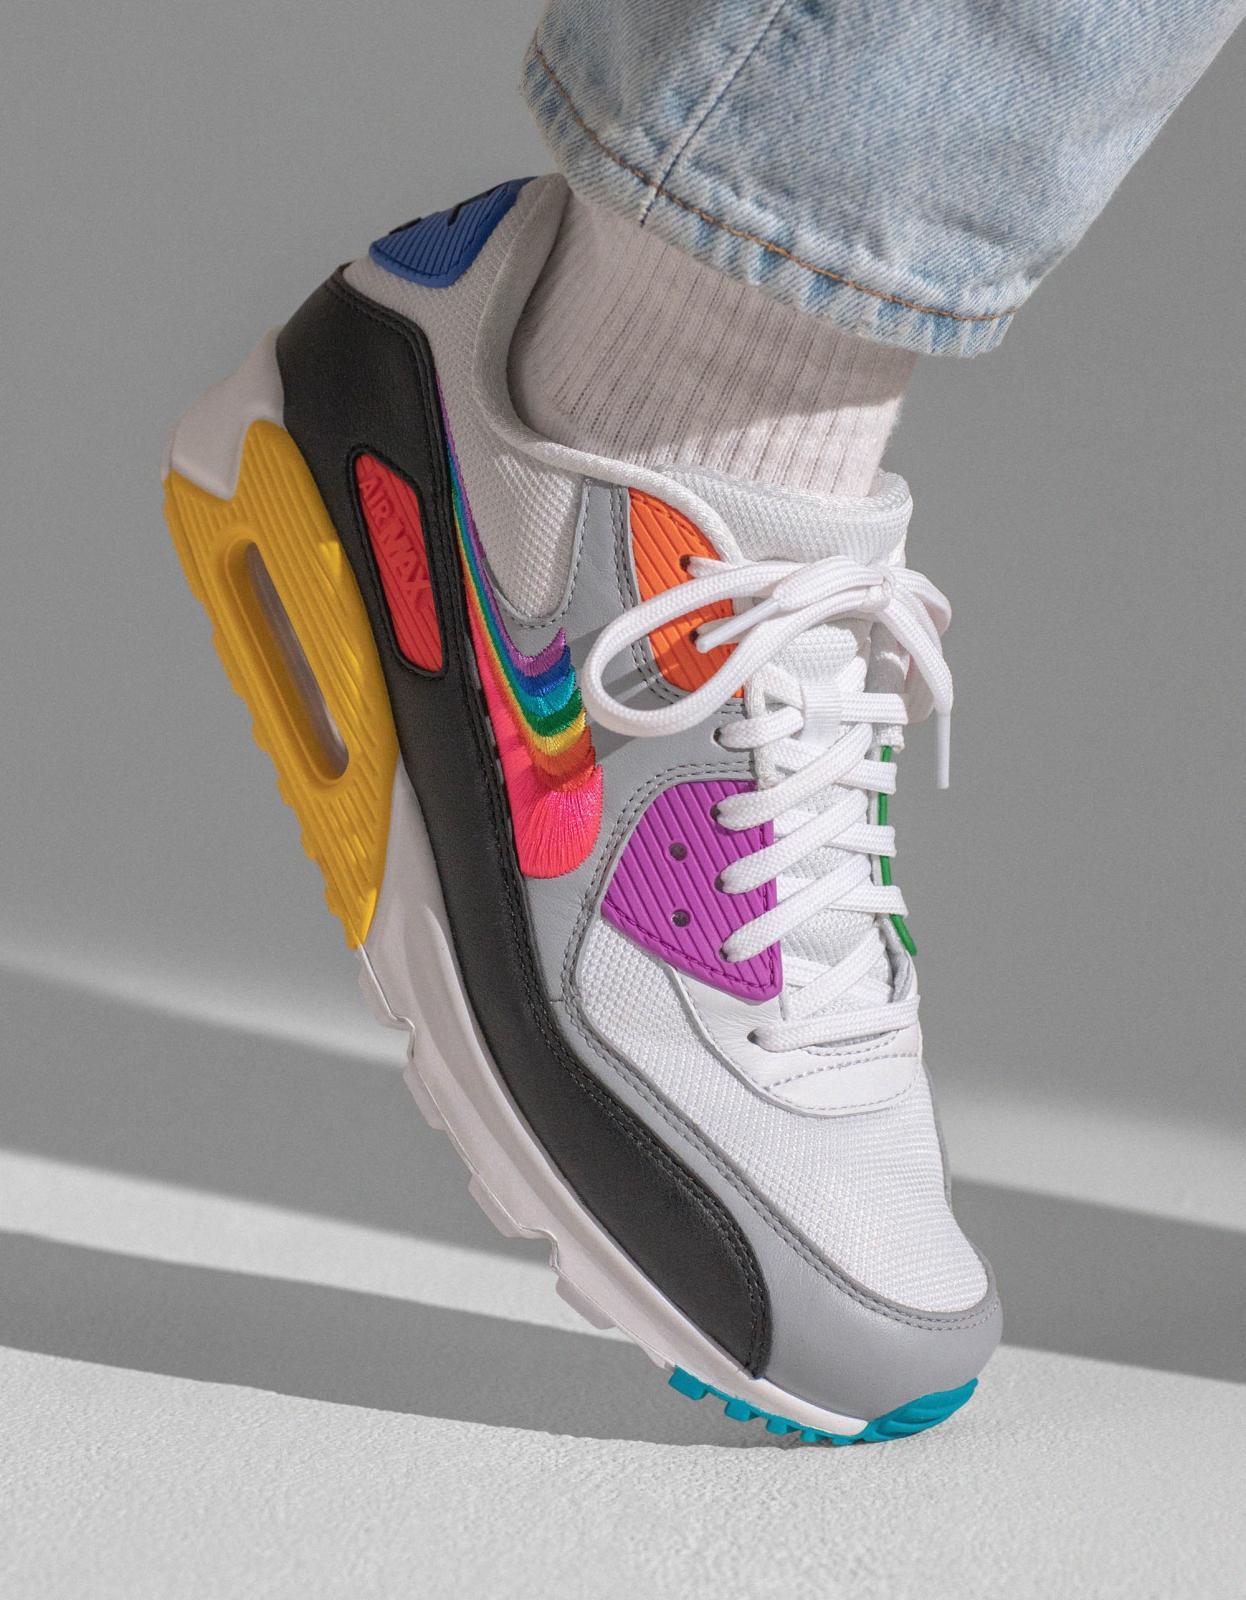 Nike släpper sin BETRUE 2019 kollektion | Dopest